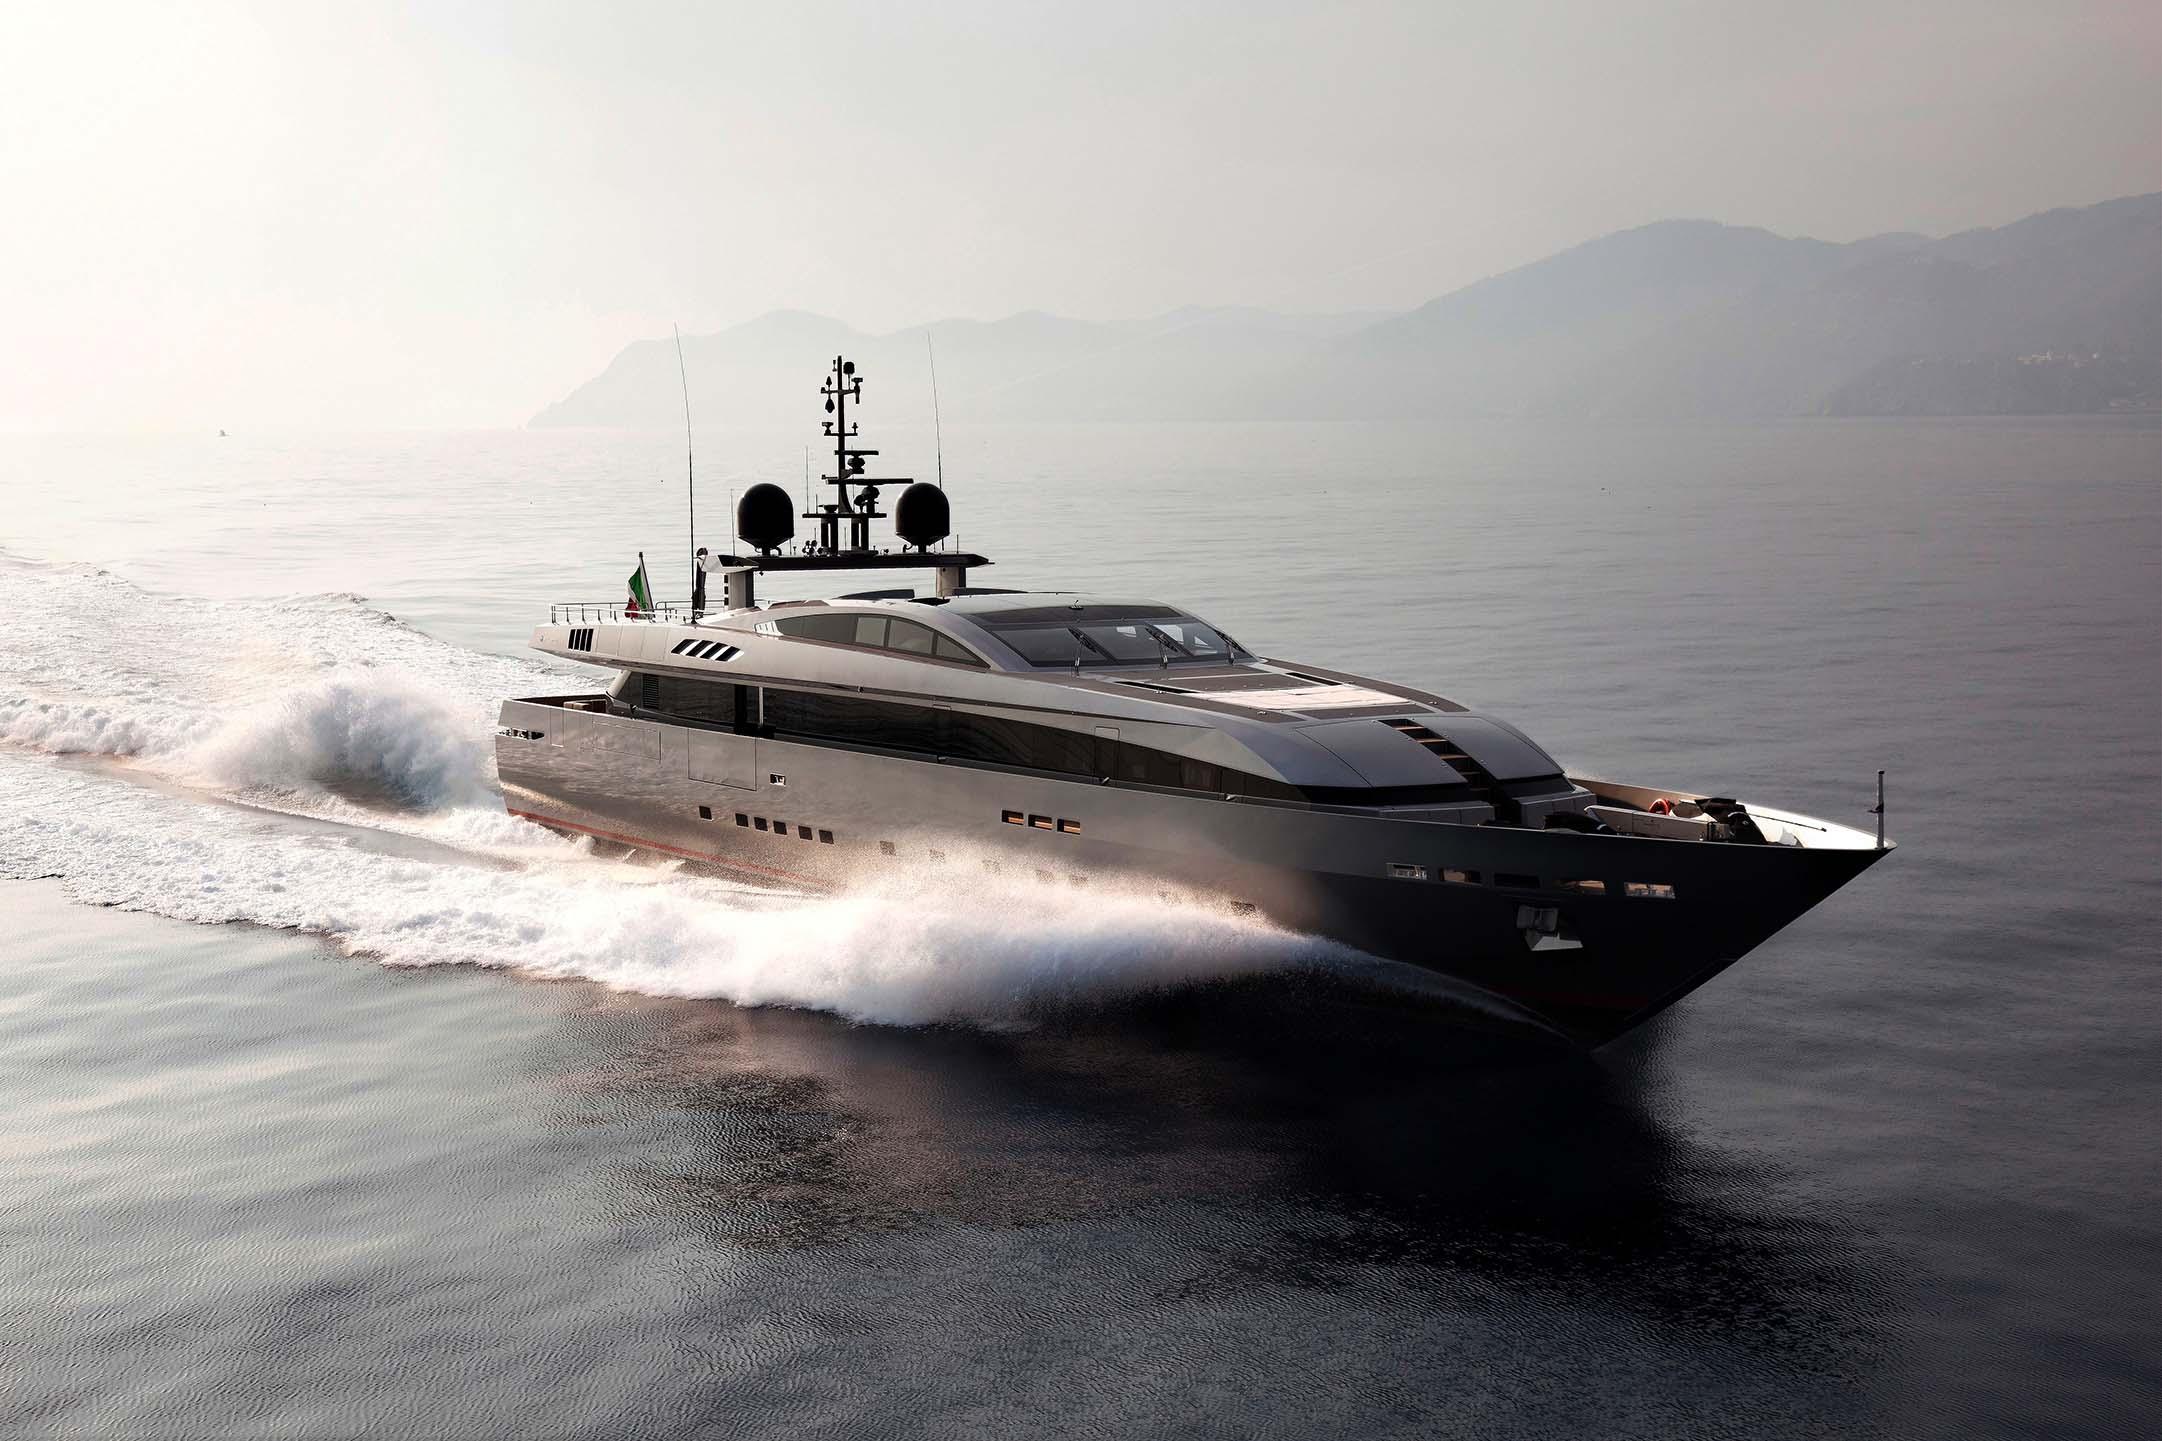 baglietto - MONOKINI - Paskowsky Yacht Design